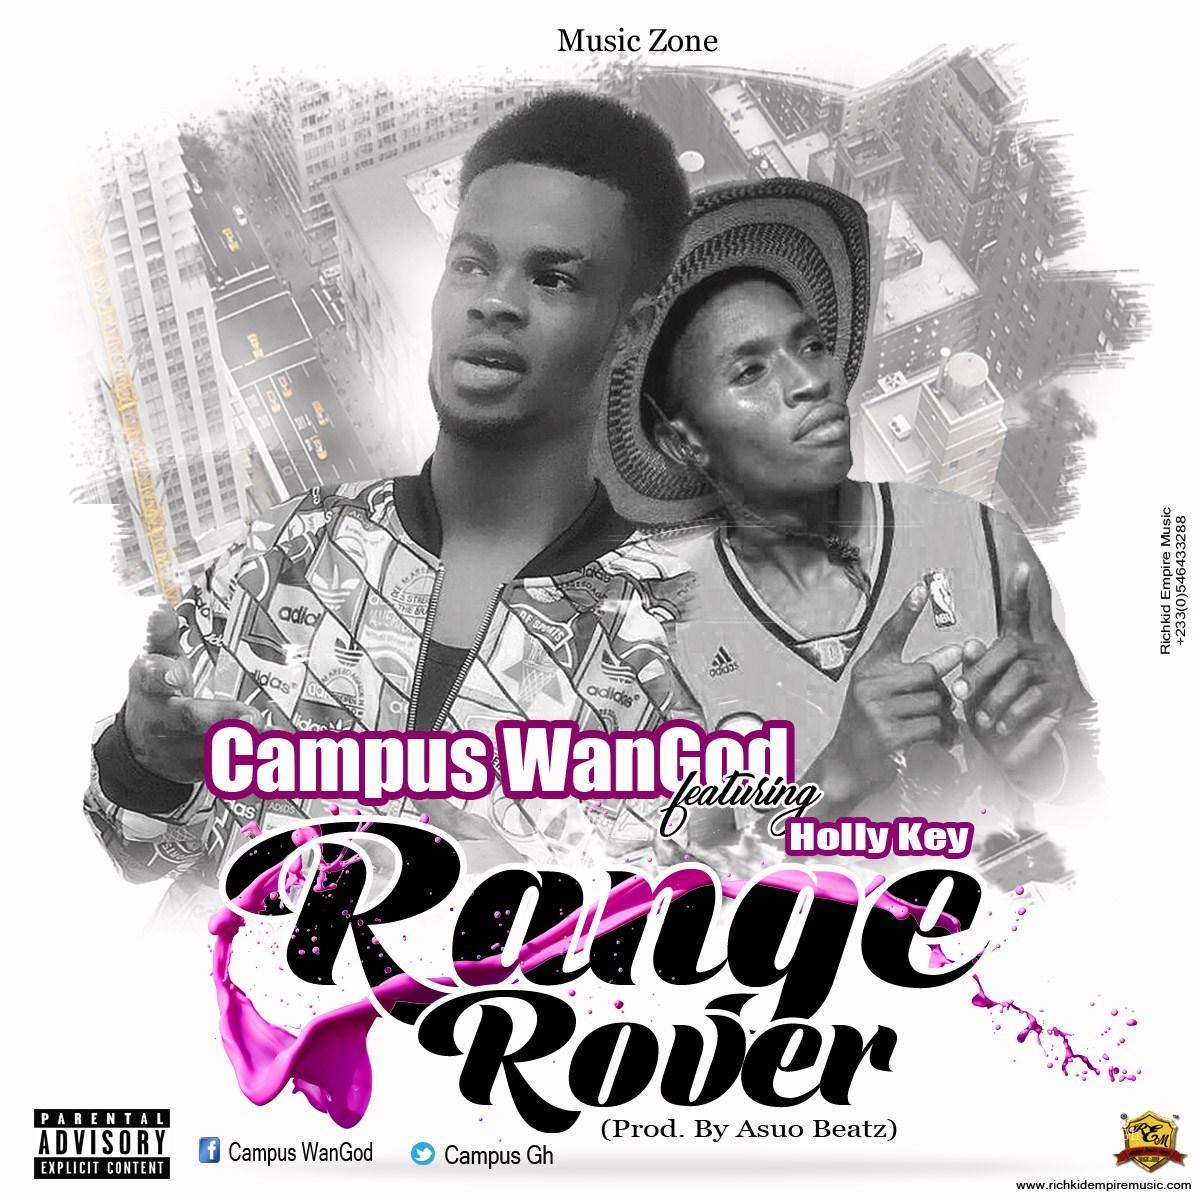 Campus WanGod Range Rover ft